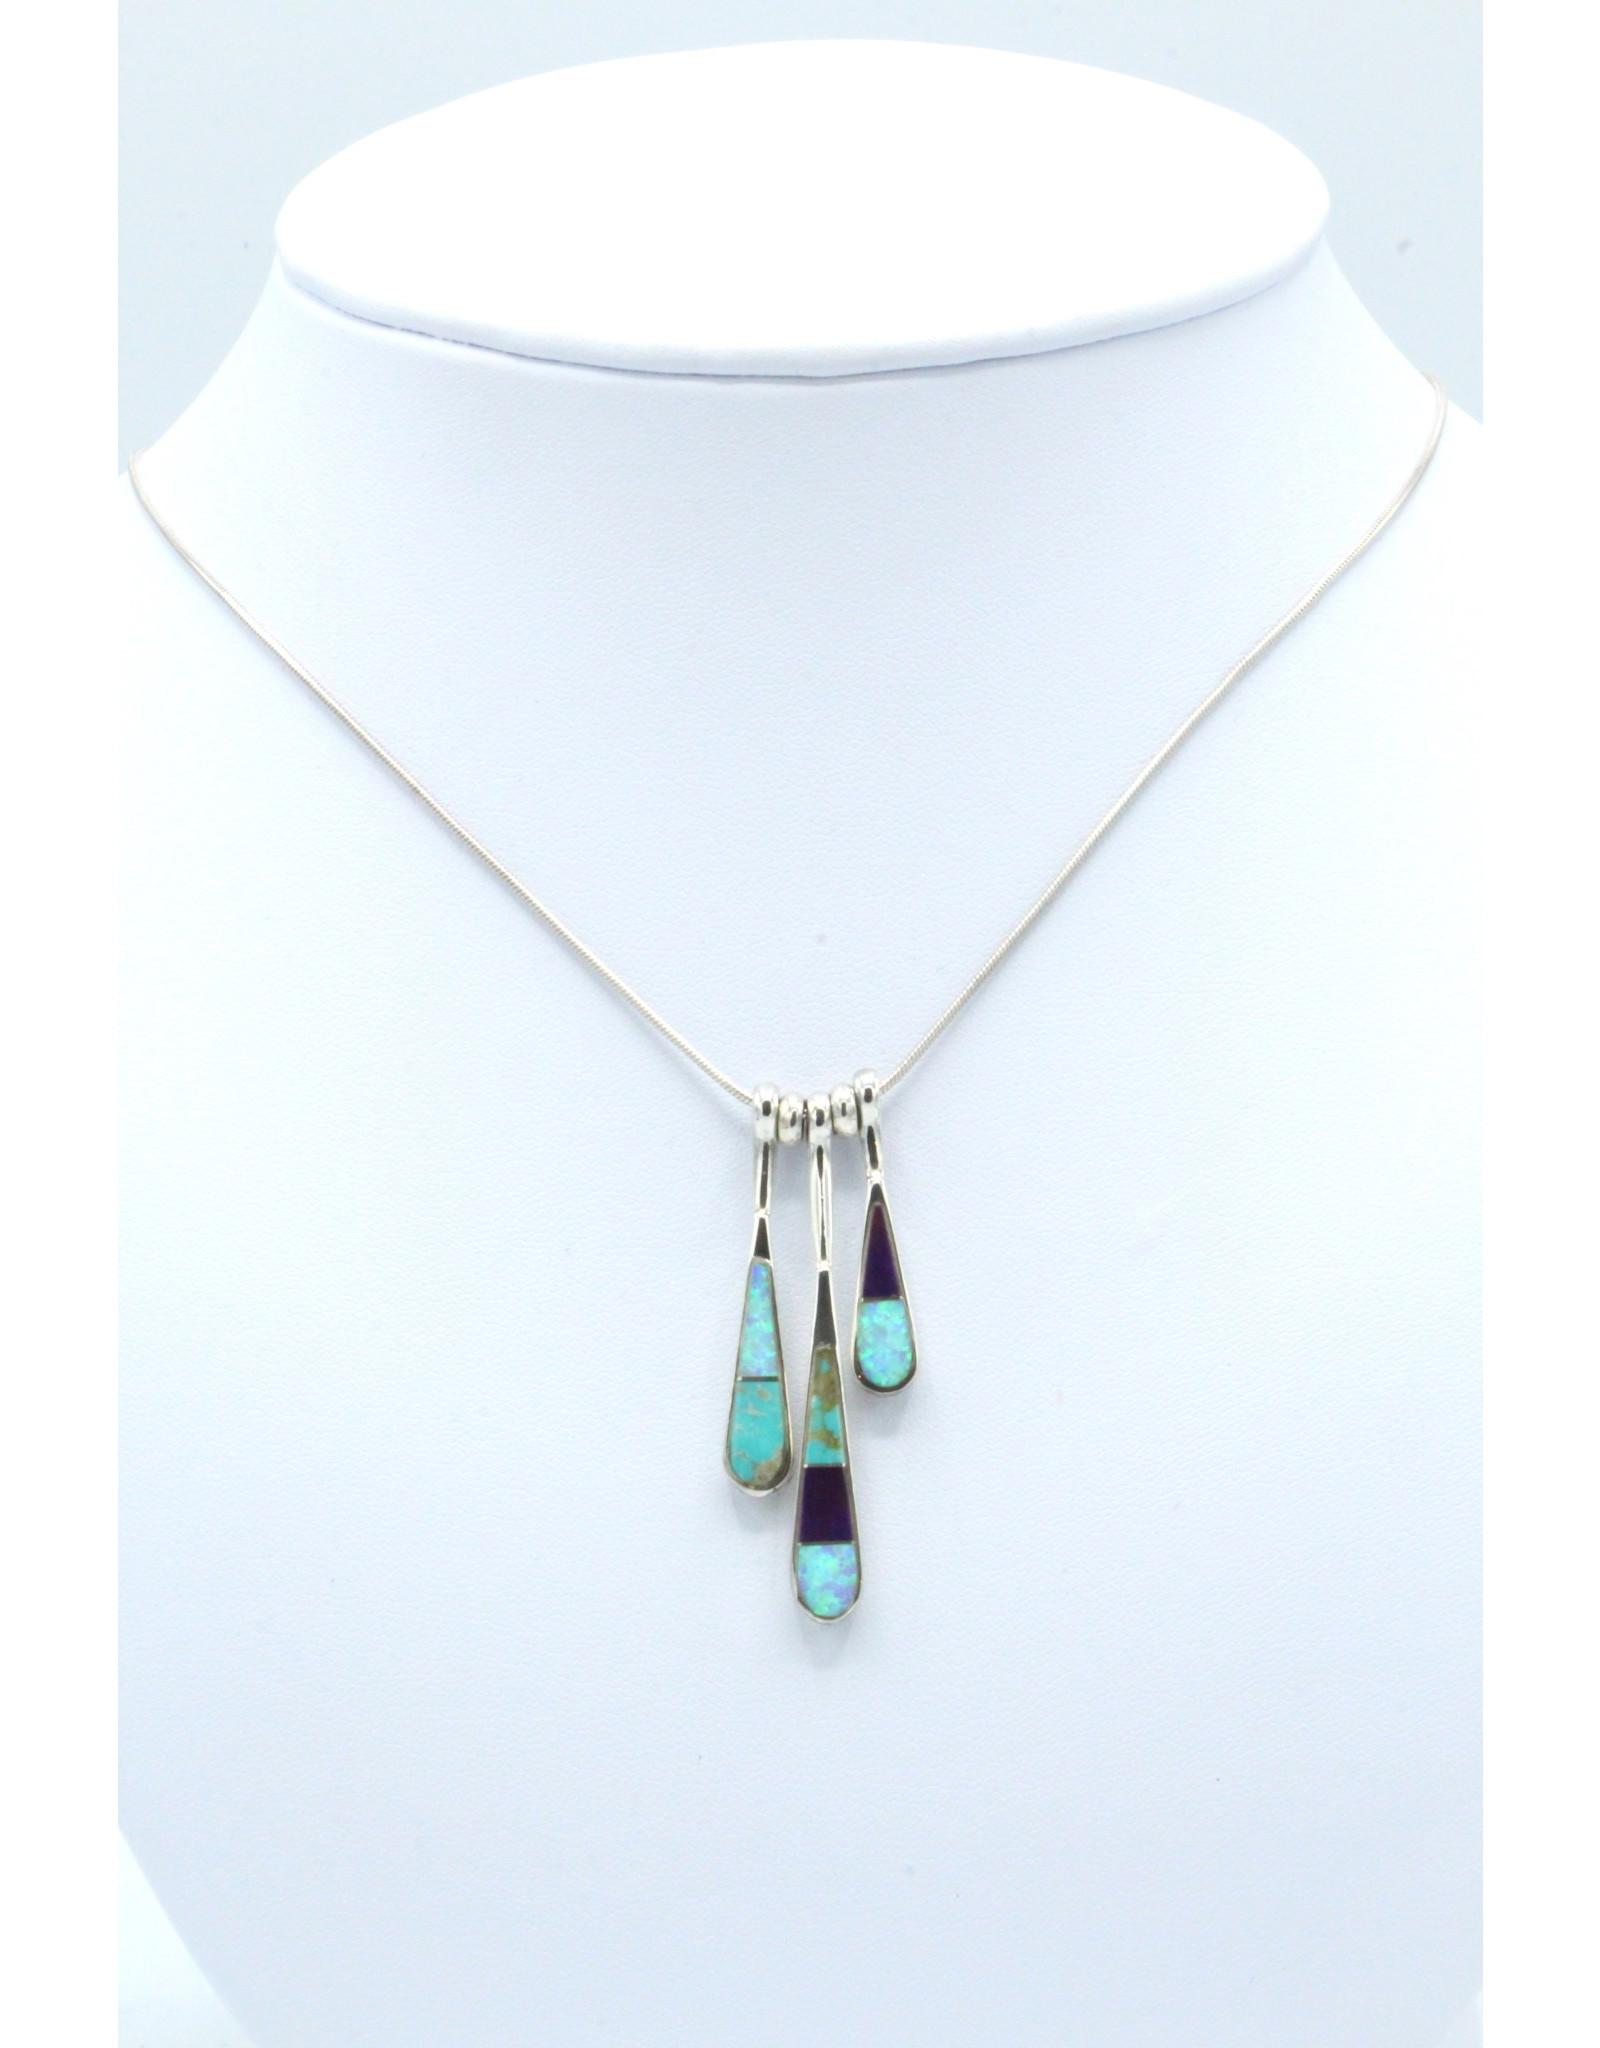 3 Tear Necklace - N108-5